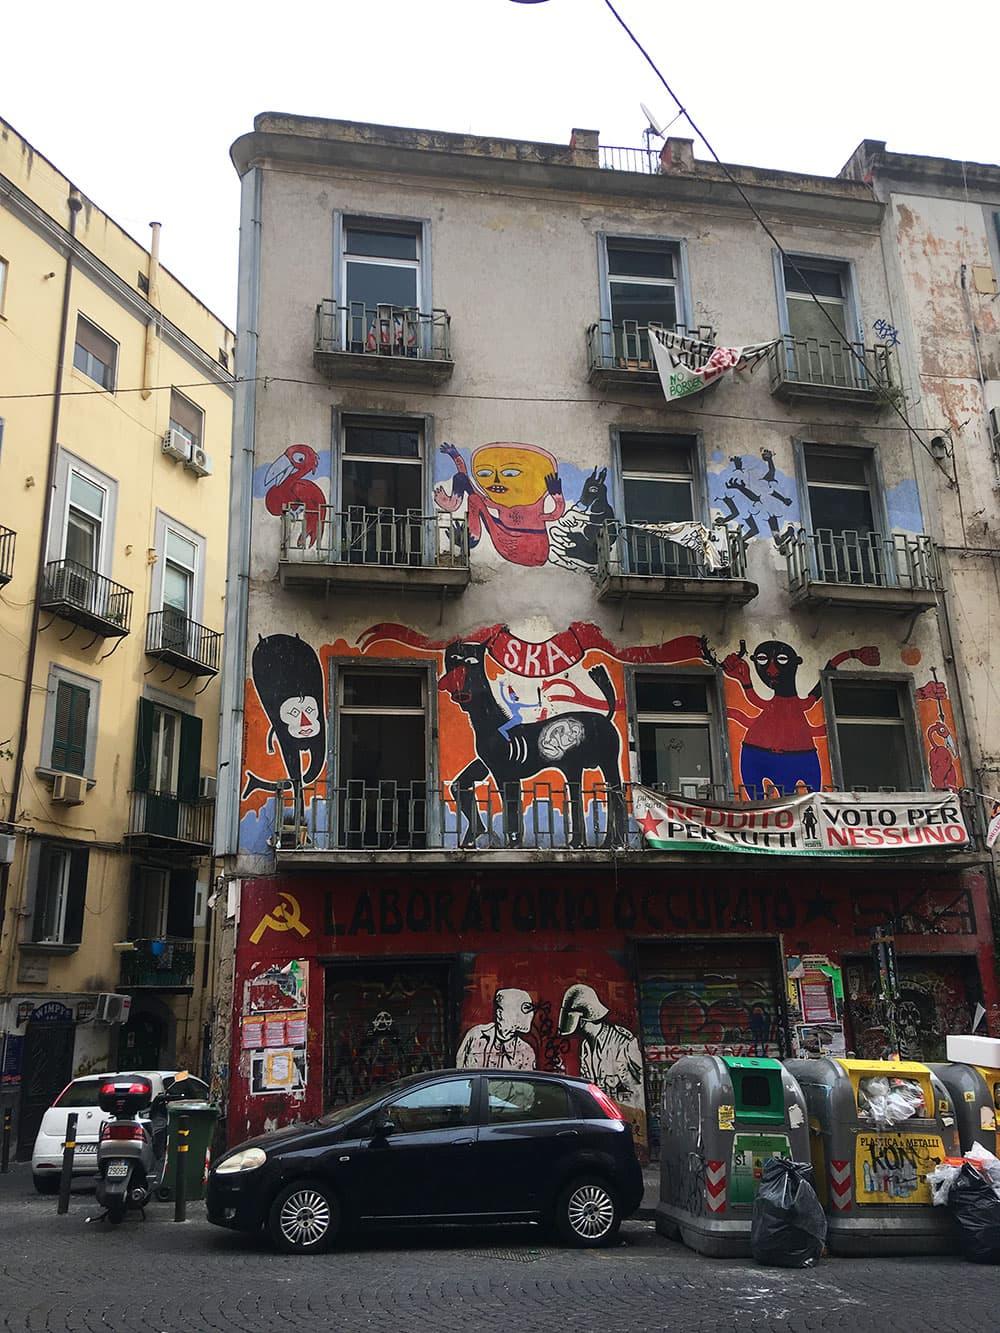 Bins & street art in Naples